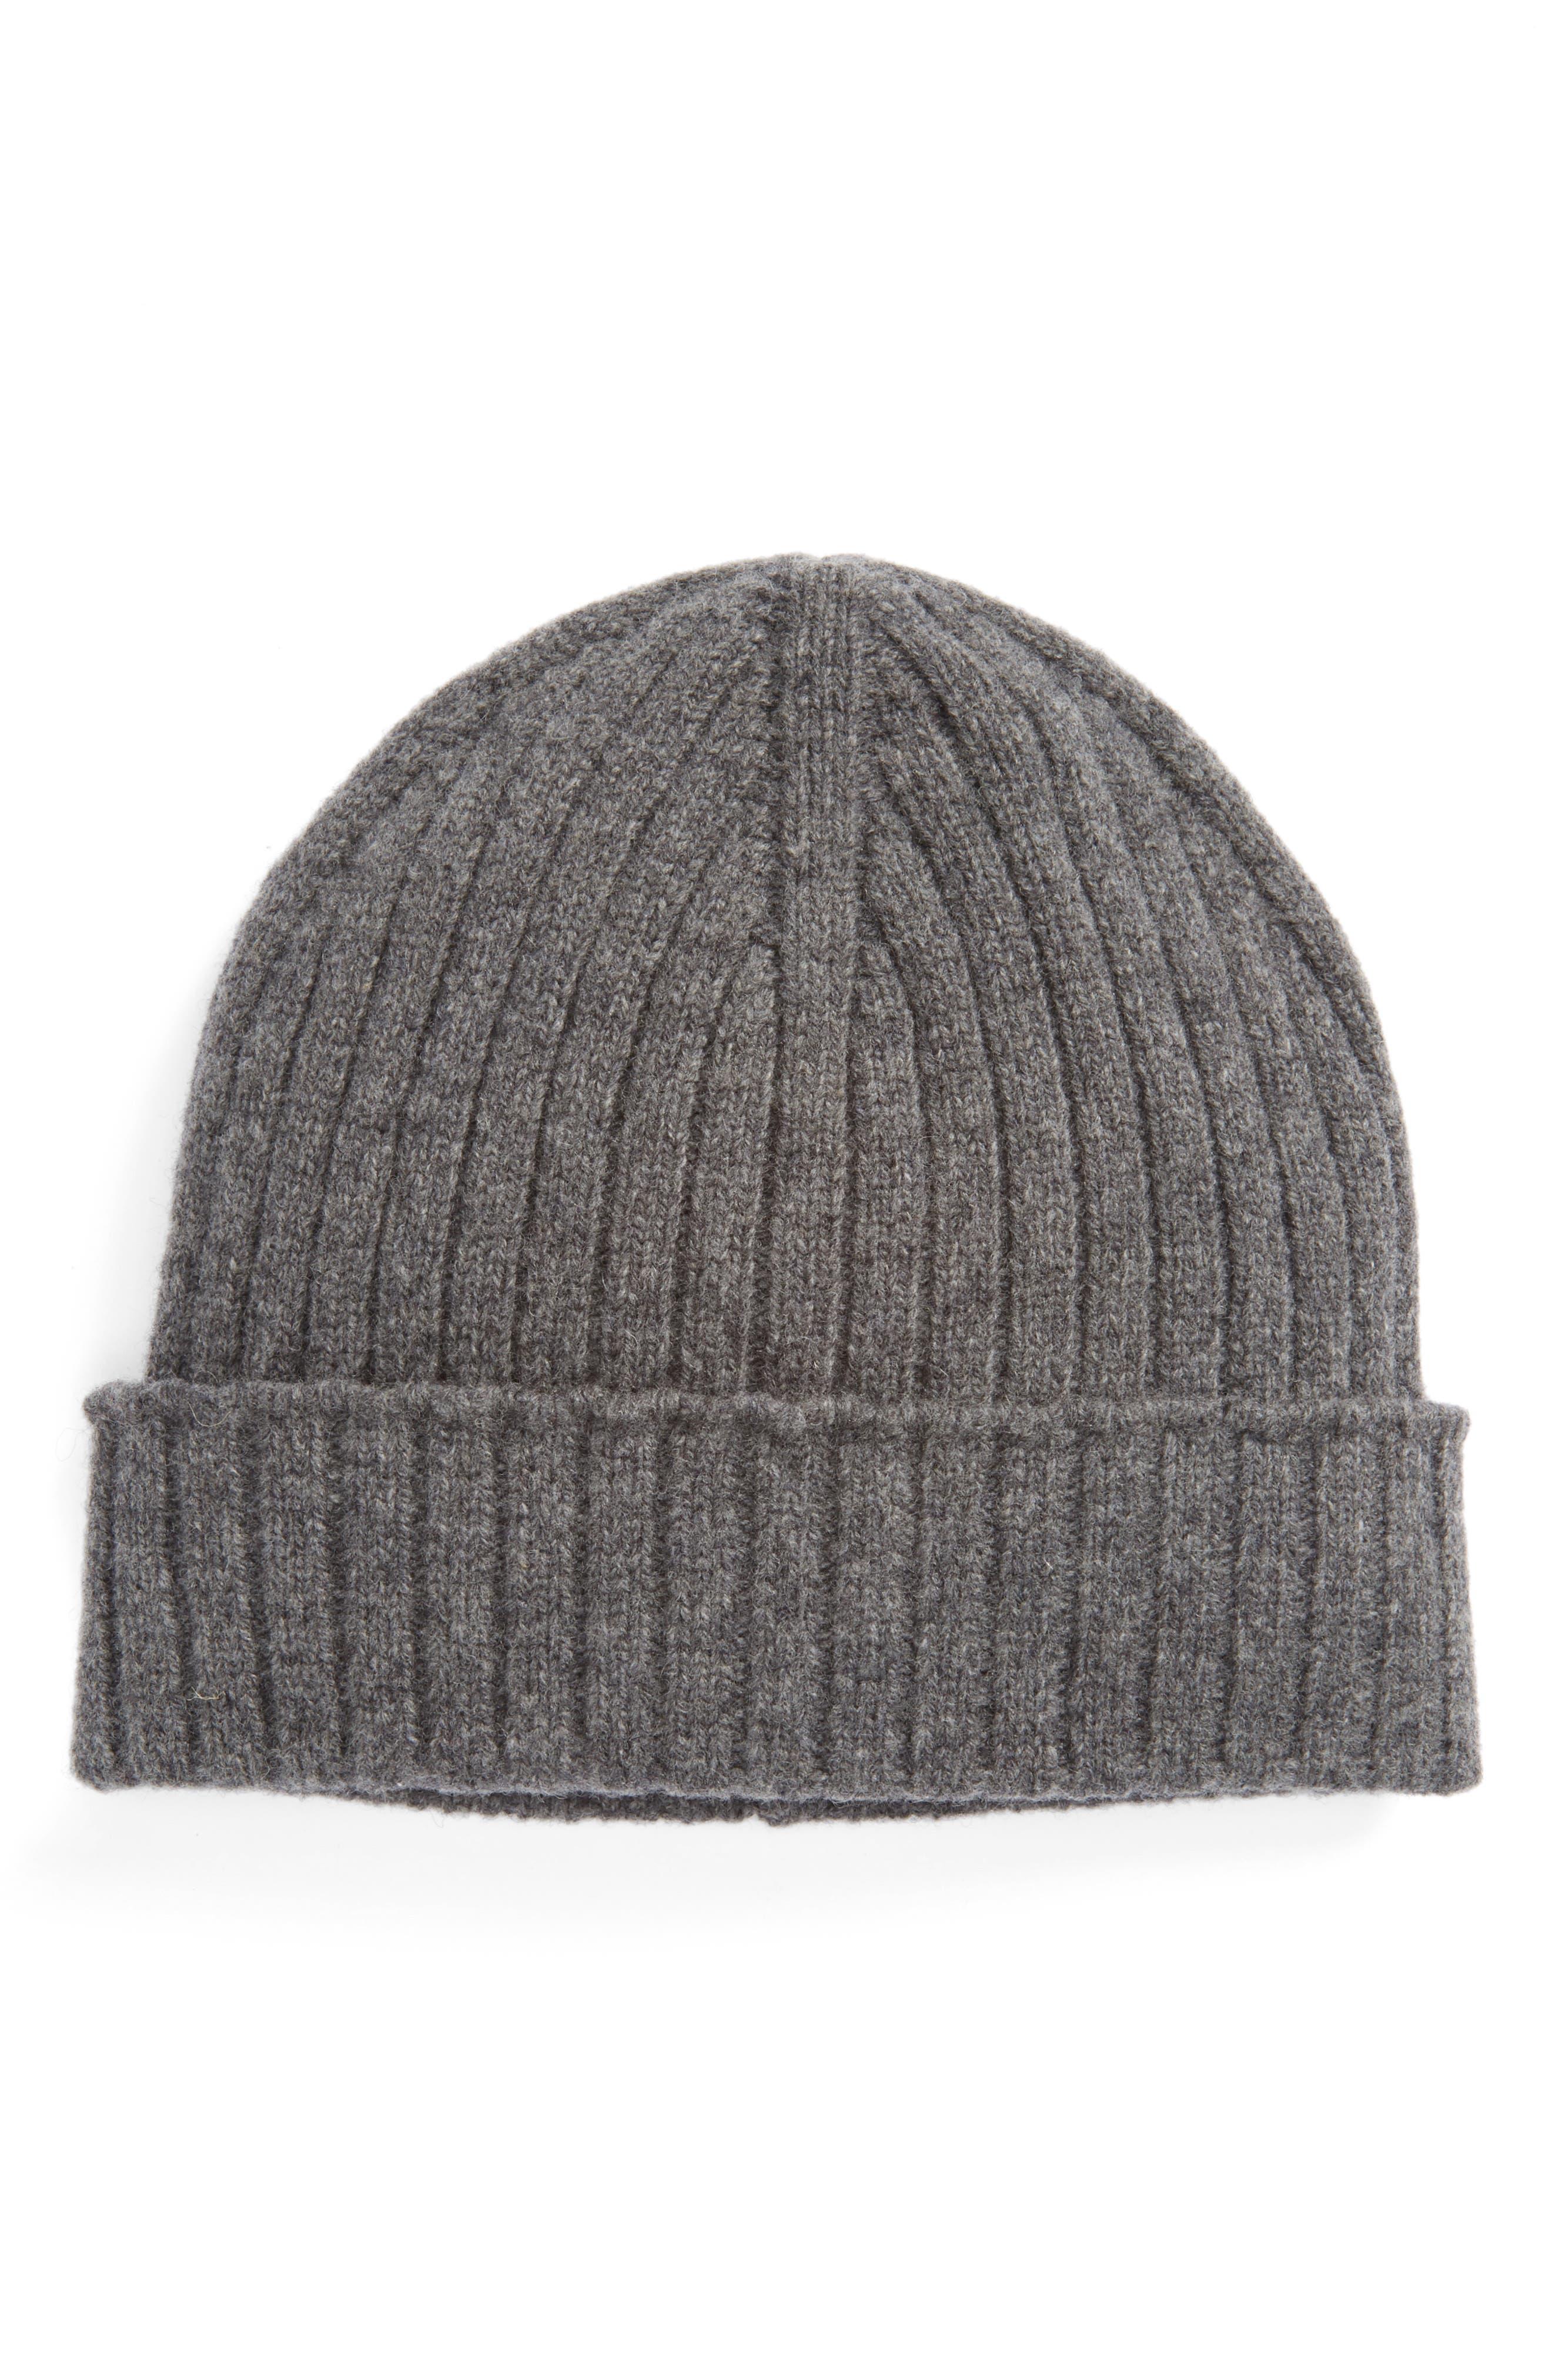 Main Image - A.P.C. Wool Knit Cap